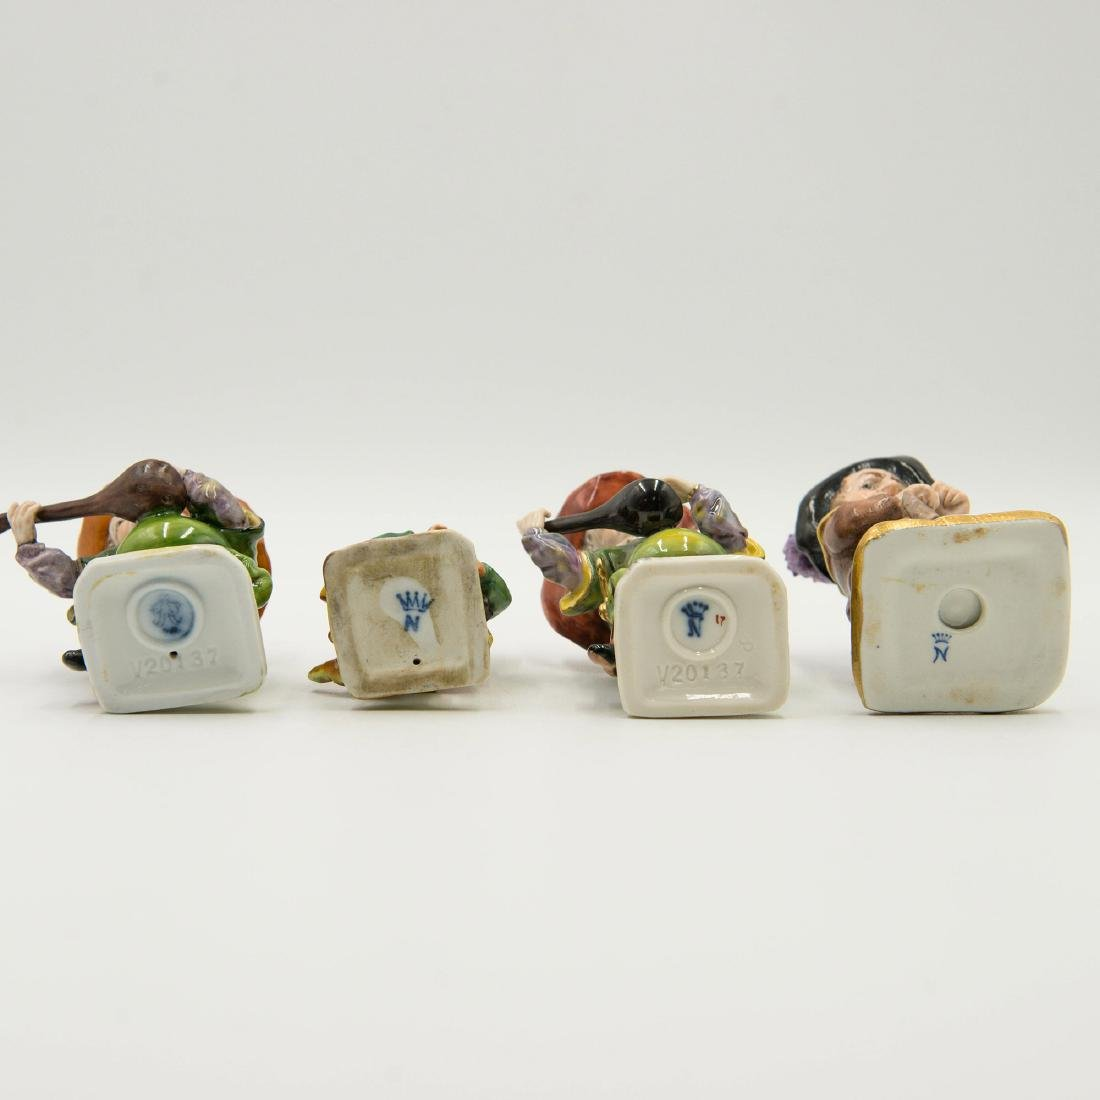 Capodimonte Porcelain Group of 4 Gnomes Dwarfs - 5